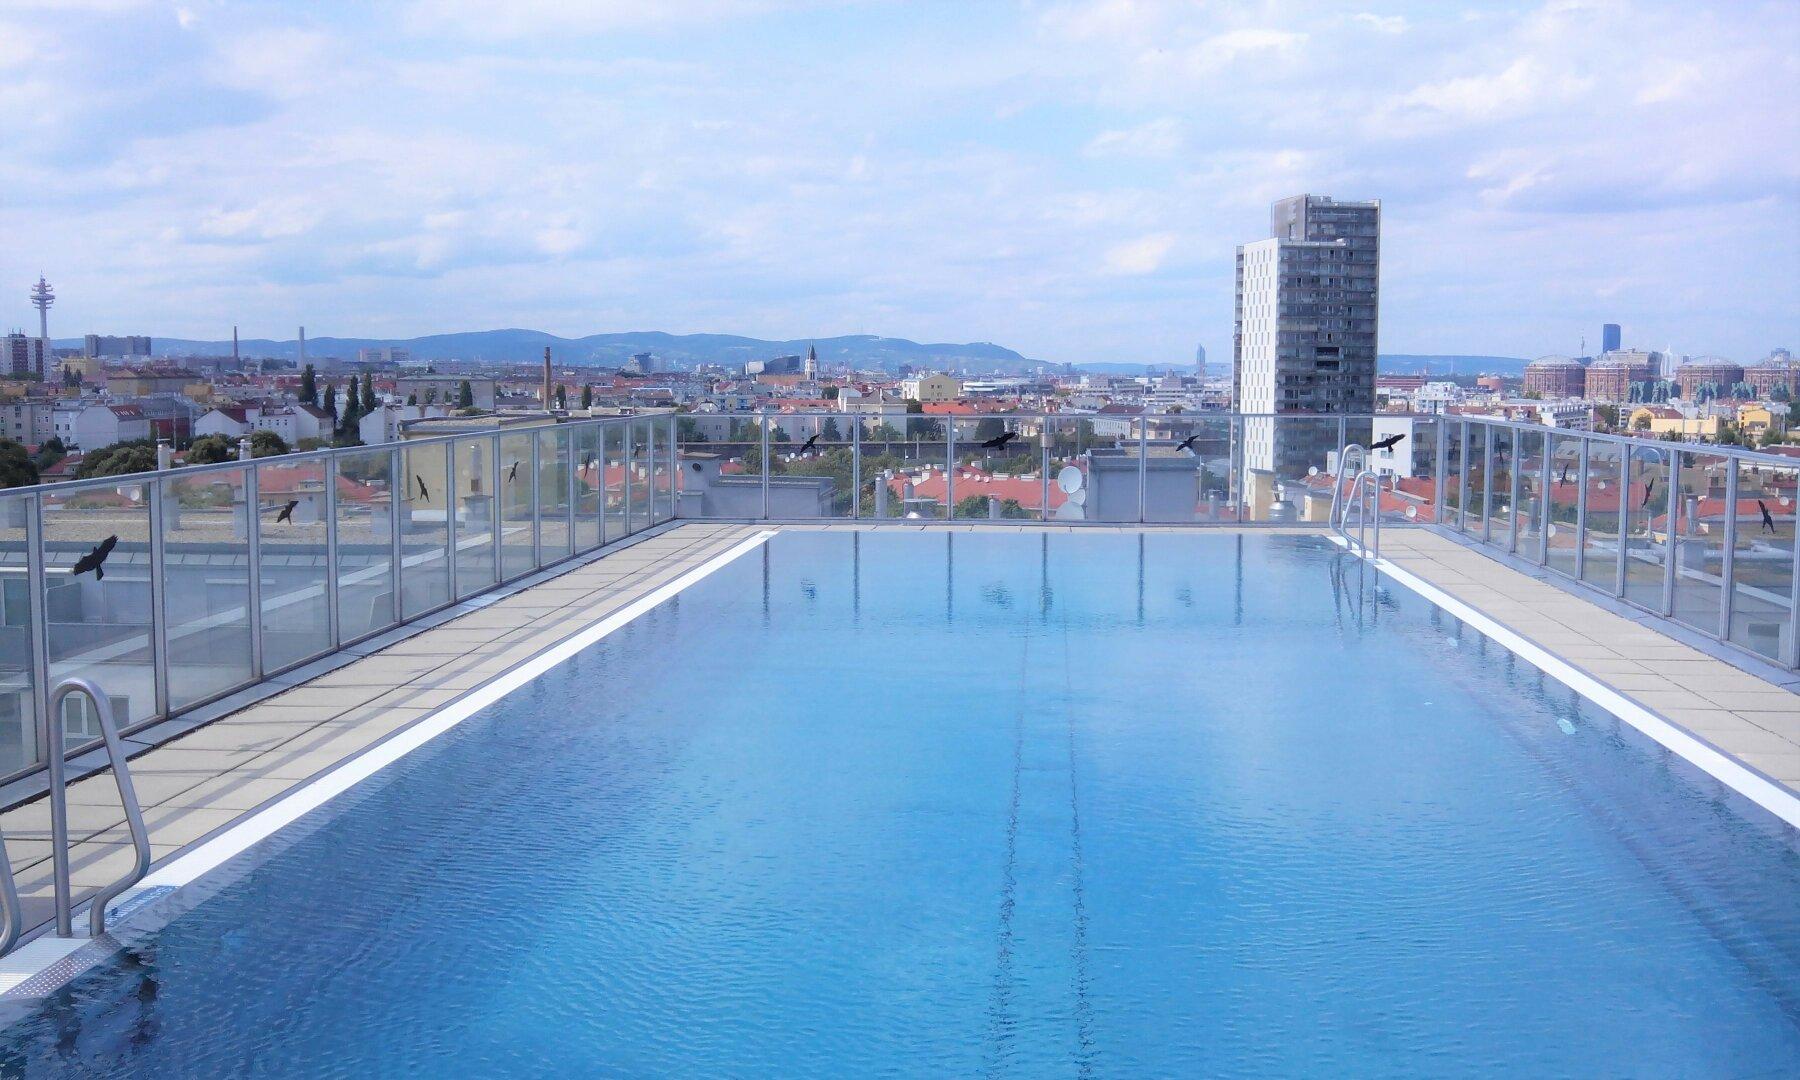 Dach-Swimmingpool